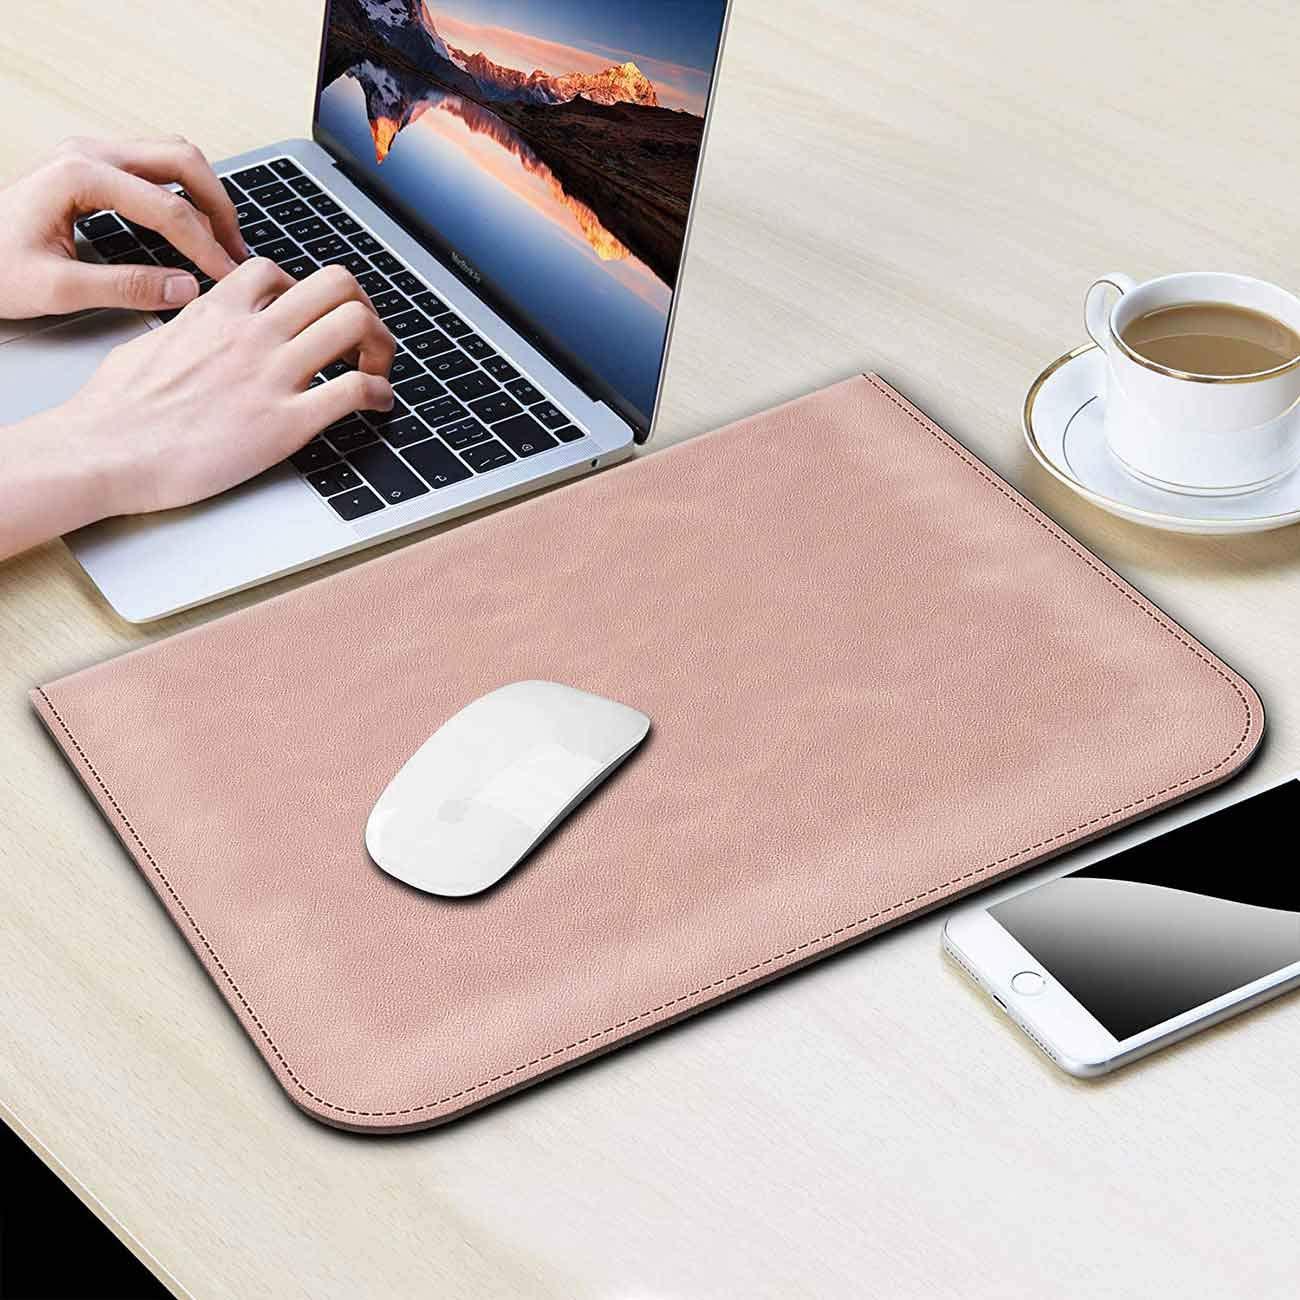 Lenovo ThinkPad X1 Carban TECOOL 13-13.3 Pulgadas Funda para Ordenador Port/átil Verde Cuero de Gamuza Malet/ín de Bolsa y Bolsa Accesorios para MacBook Air//Pro 13,Huawei MateBook D 14